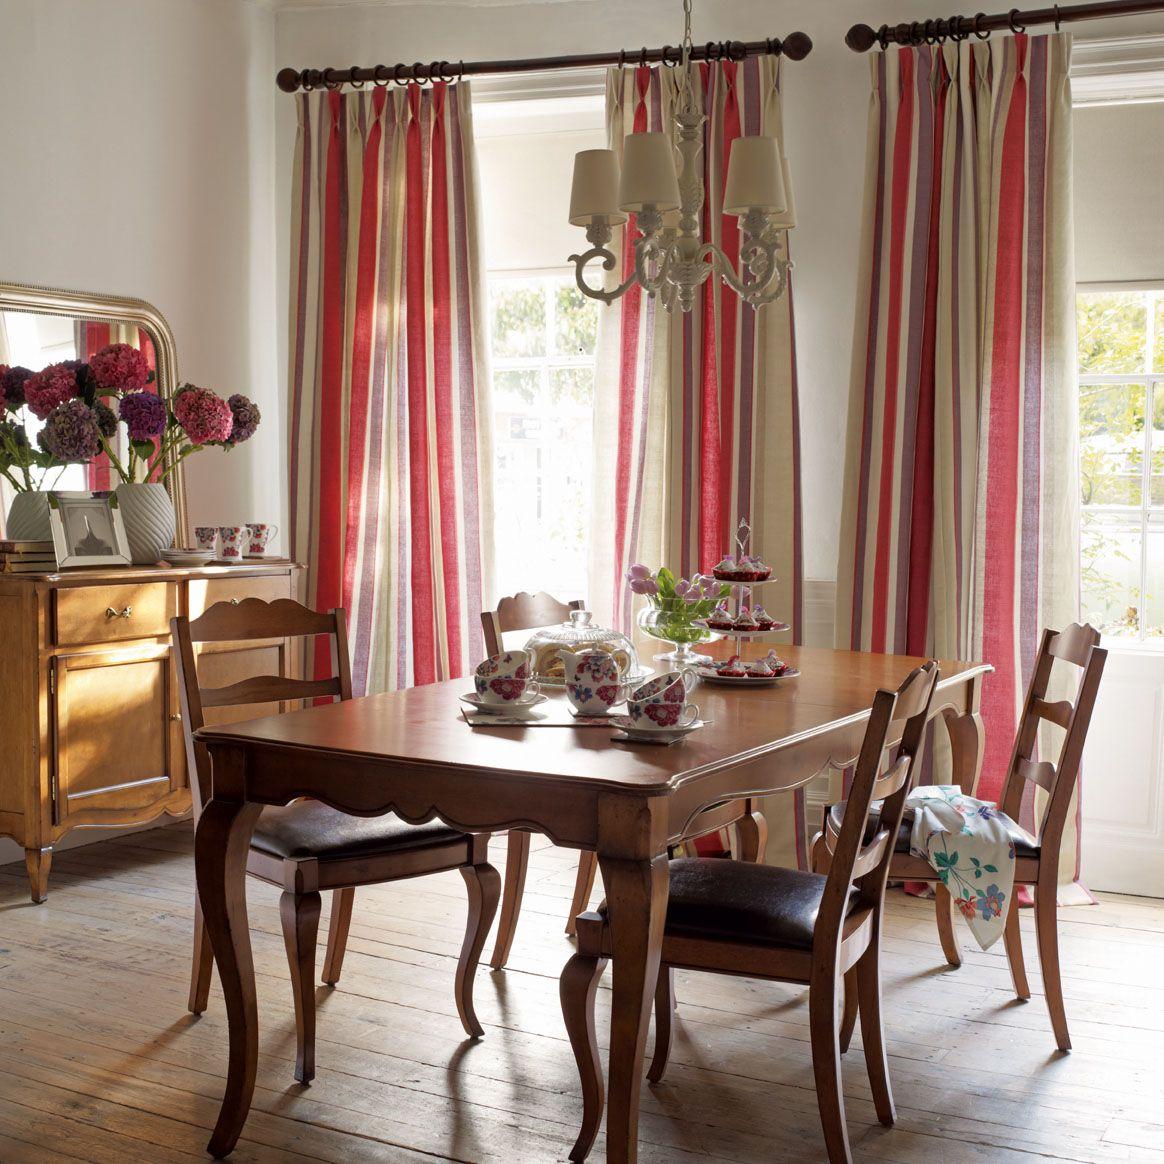 Laura Ashley Furniture Usa: Lovely Dining Room Using Laura Ashley Eaton Stripe Linen